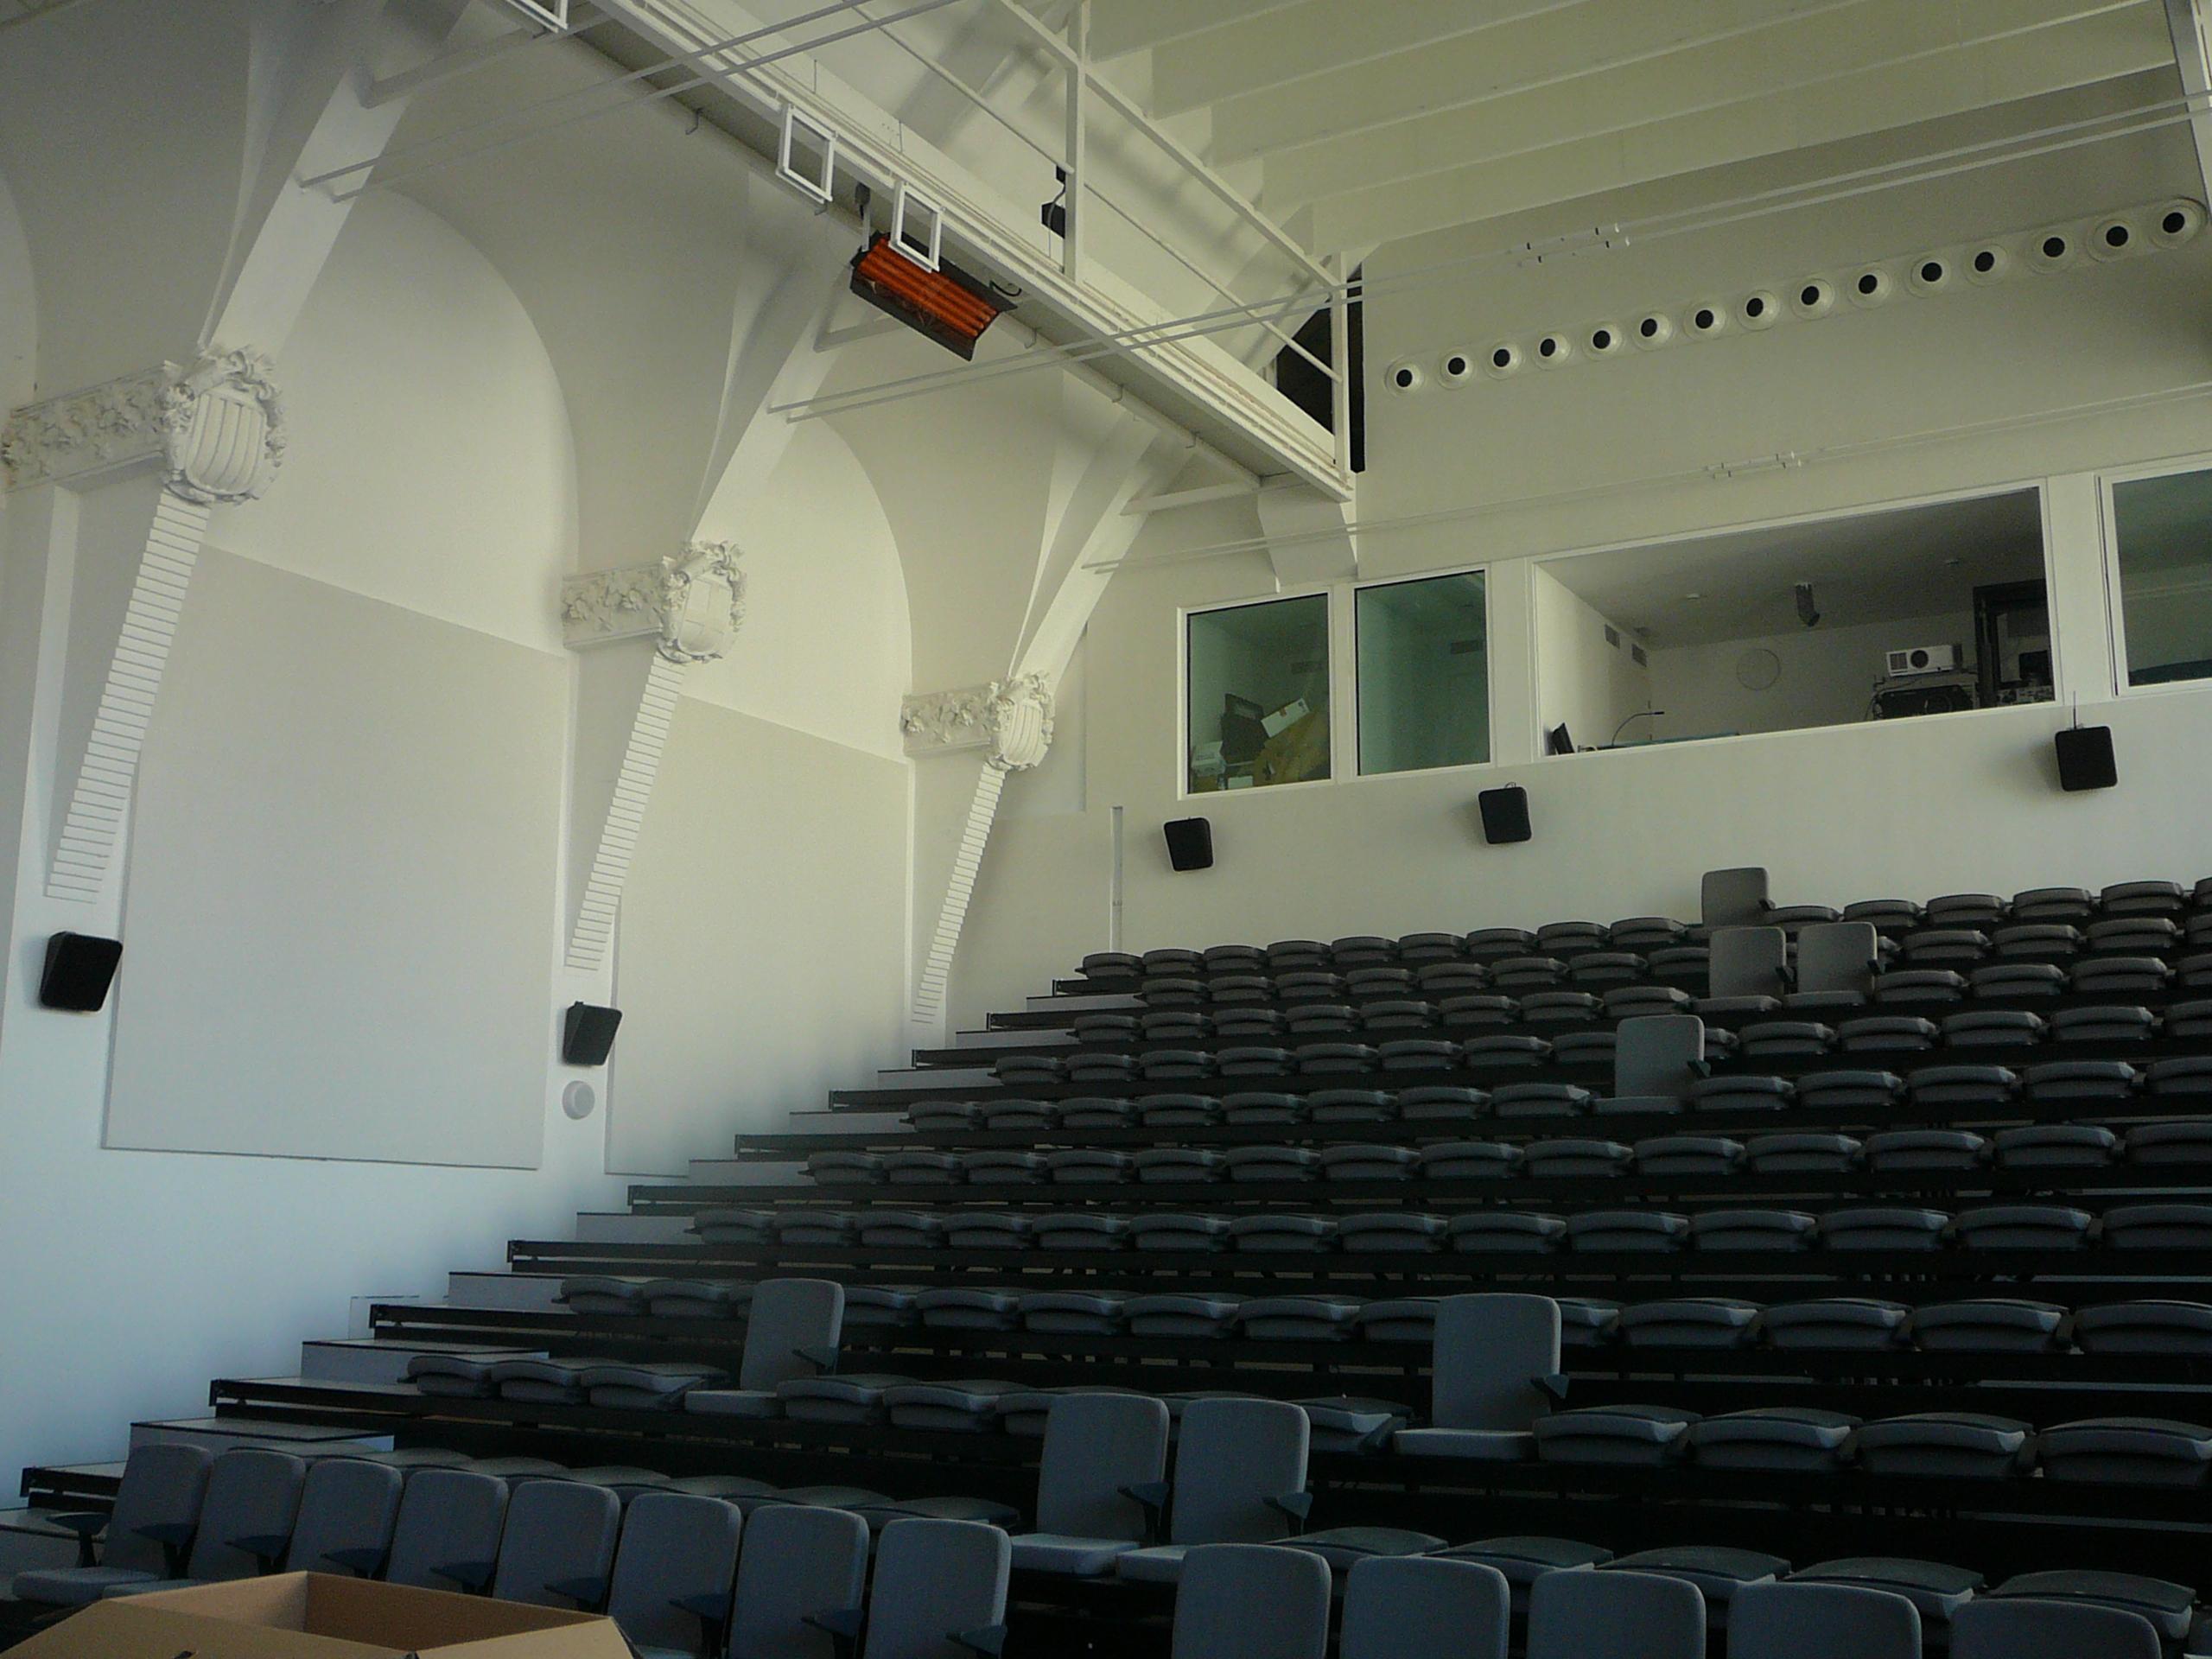 Sala Teatre pinta phonestop V + pinta absorber plano 4